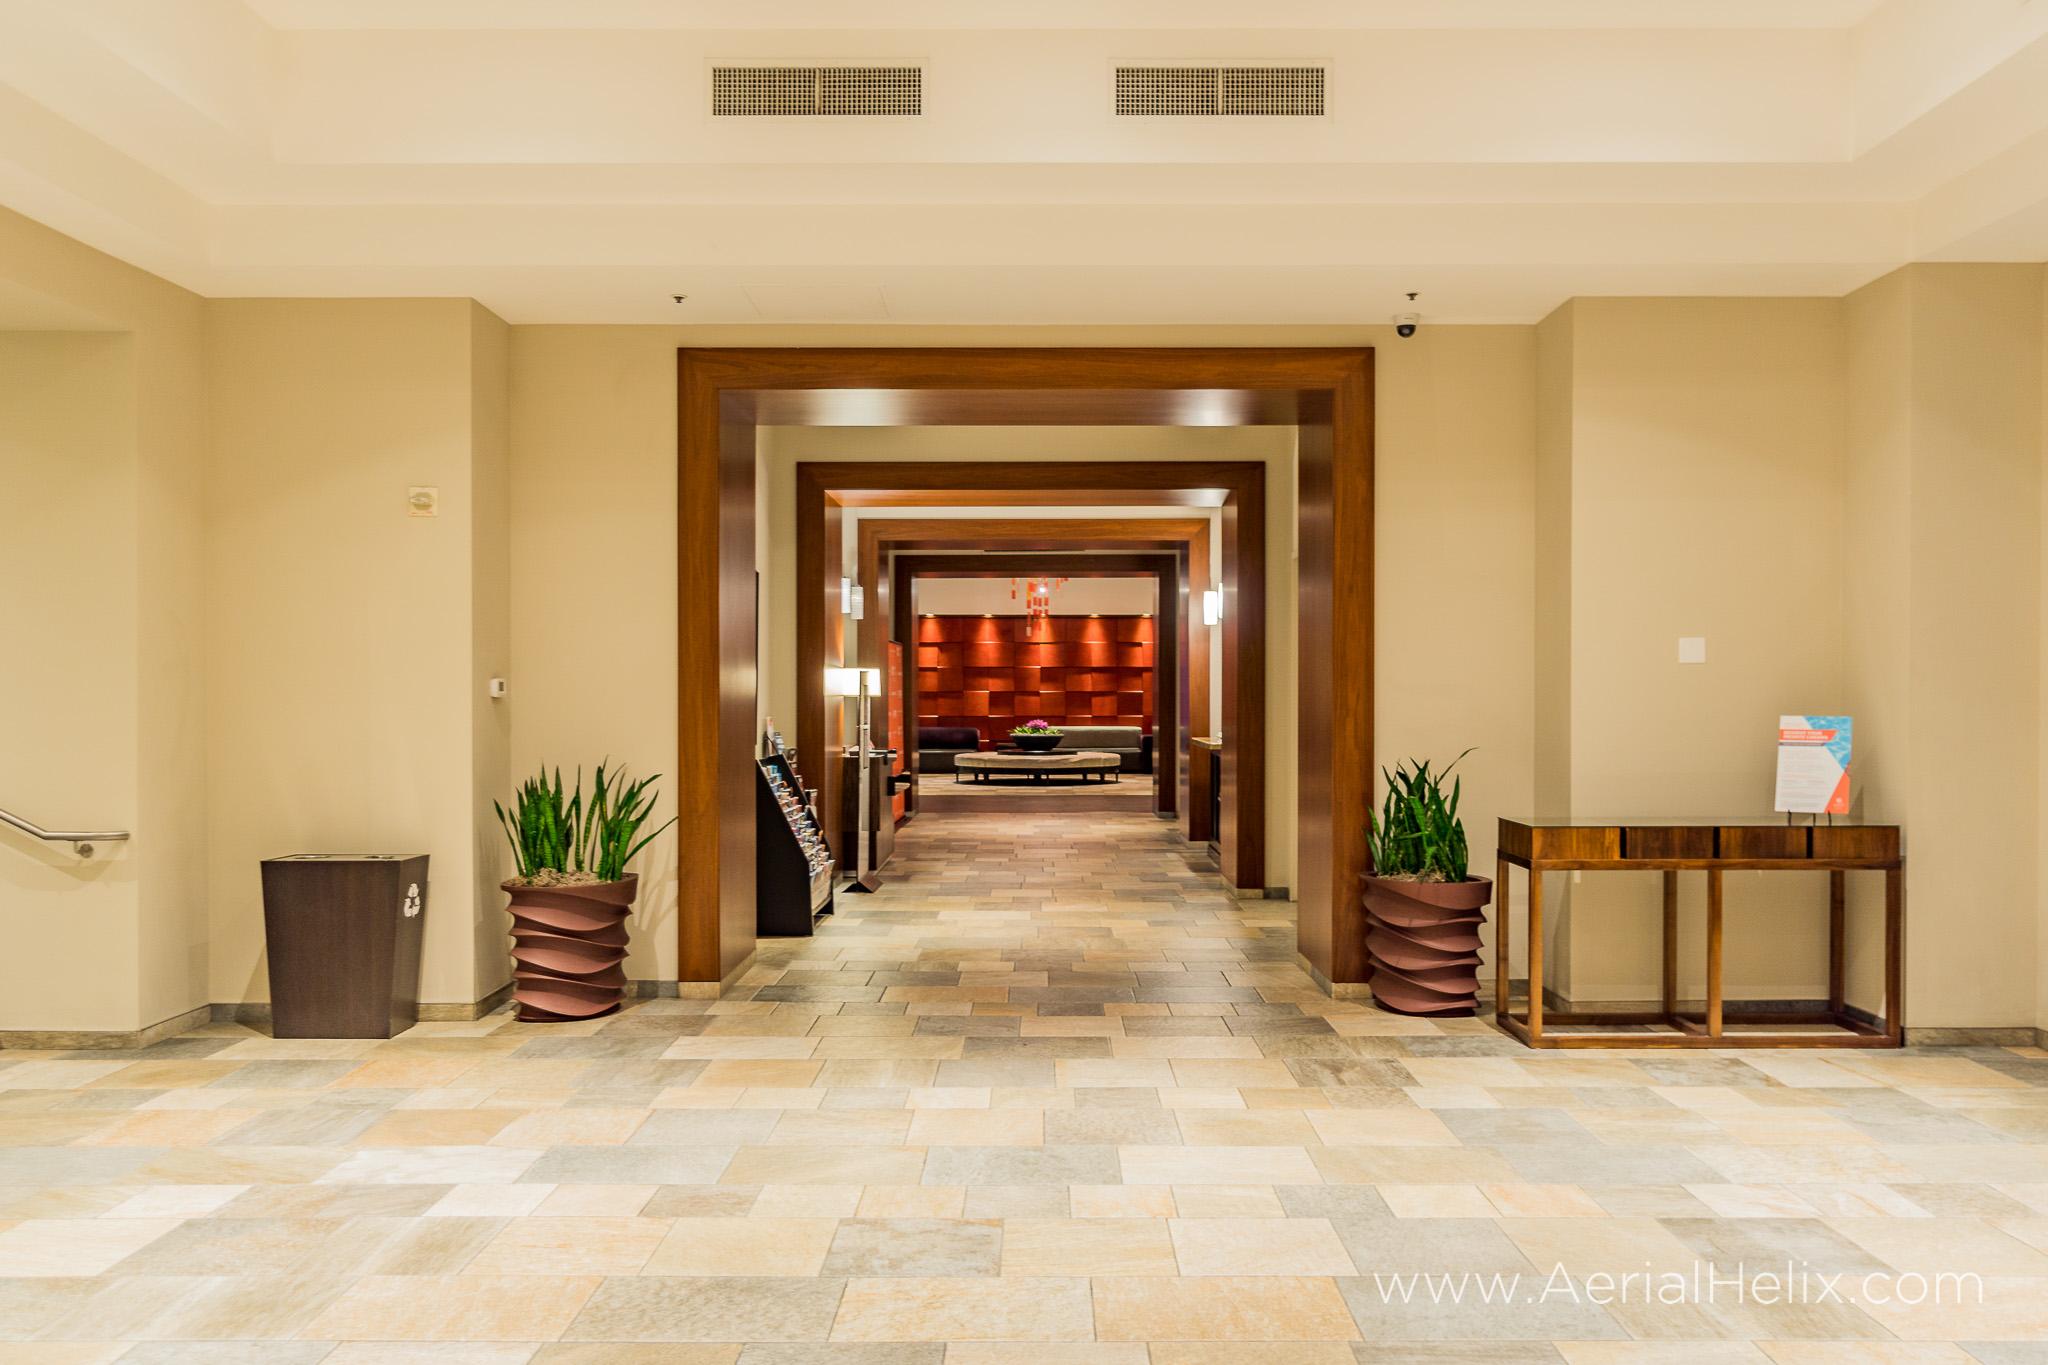 Indian Wells Hyatt Regency Set 1-1.jpg